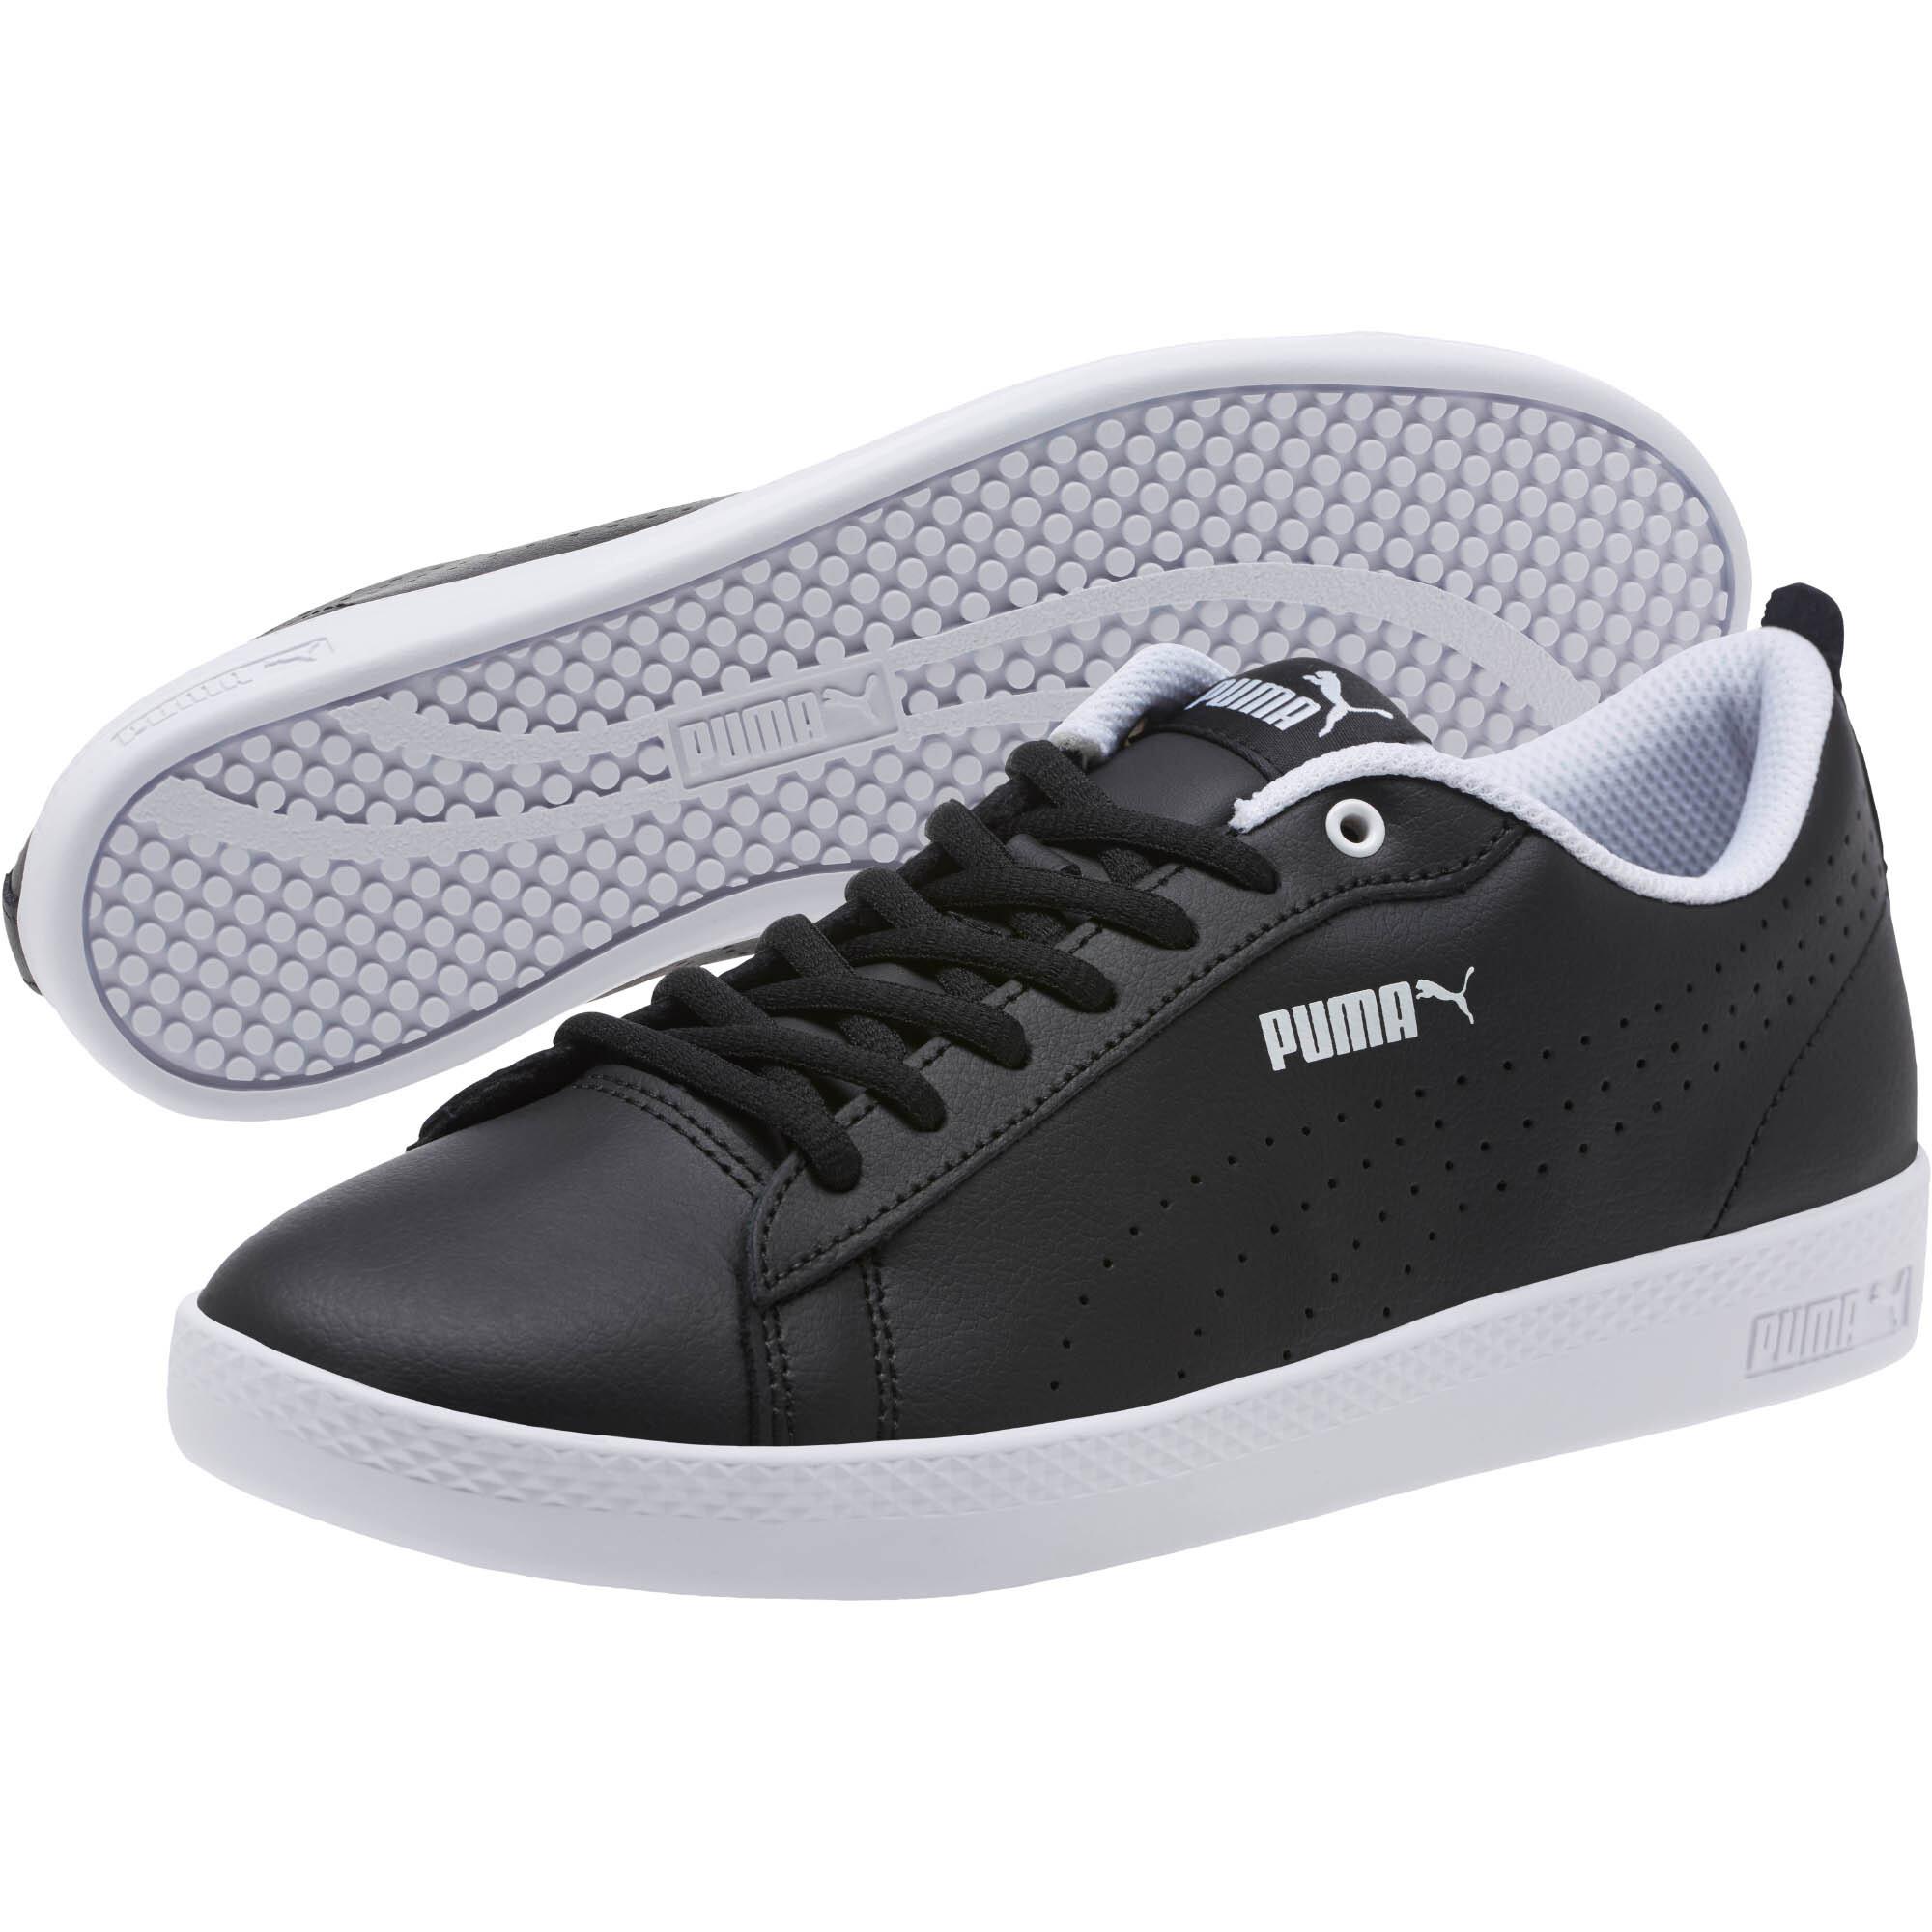 f7cabb353 PUMA Smash v2 Perf Women's Sneakers Women Shoe Basics | eBay